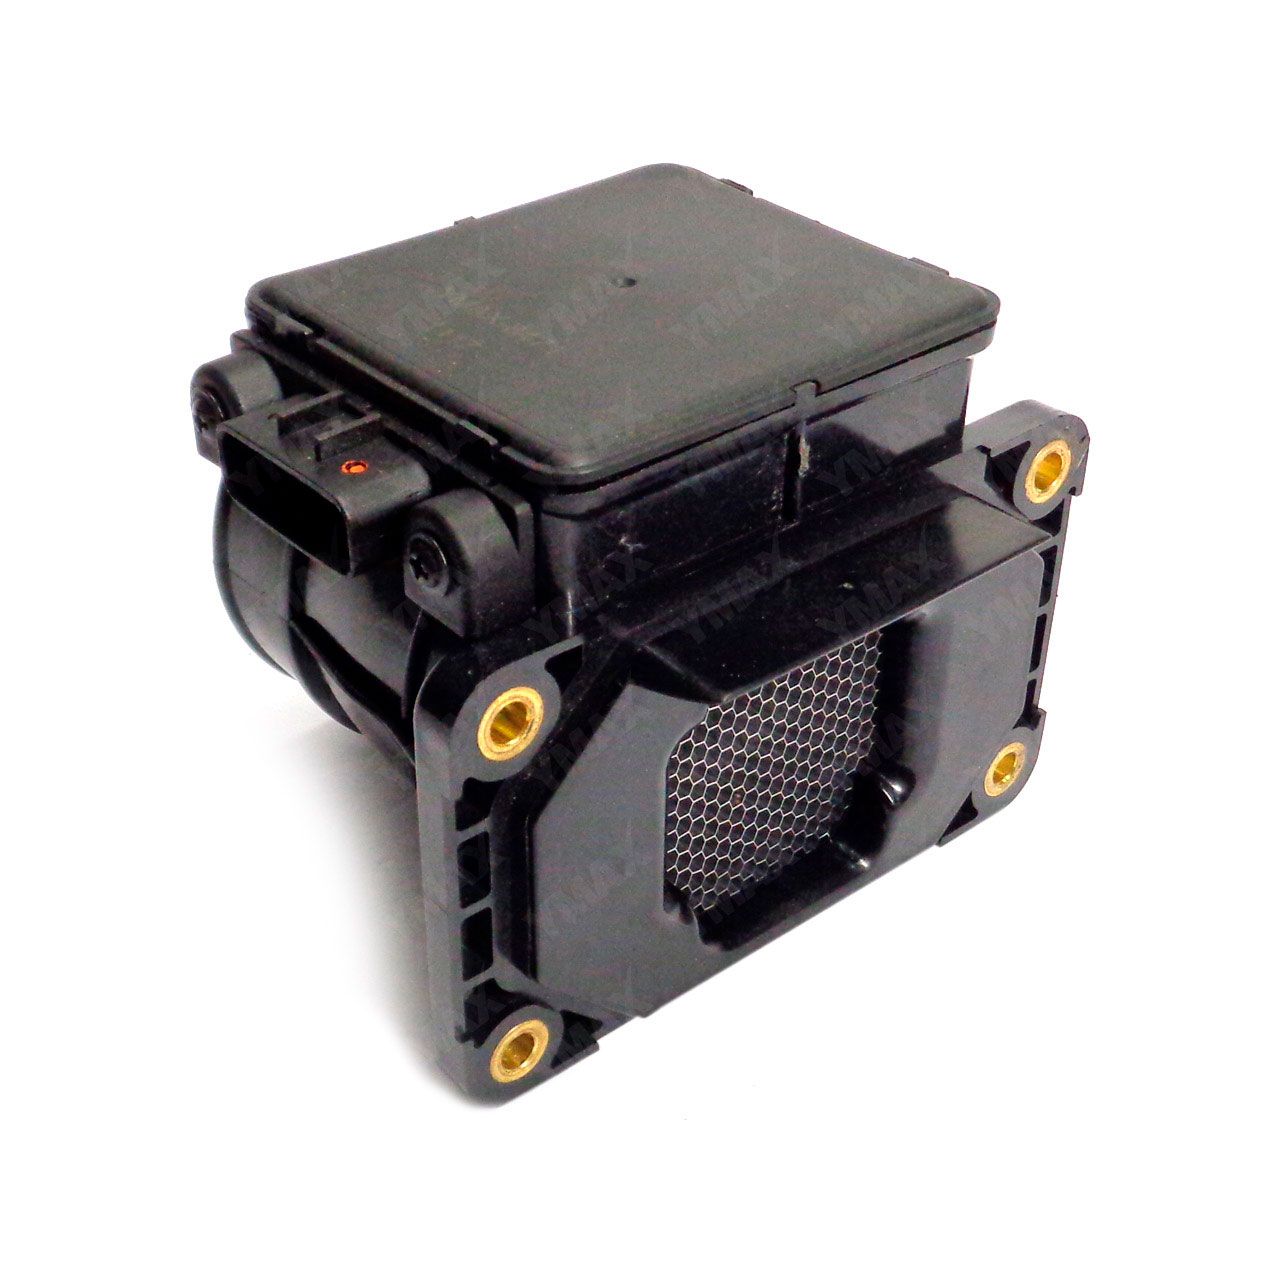 Medidor Fluxo de Ar PAJERO TR4 LANCER (YMX8471) - YMAX - PEÇ